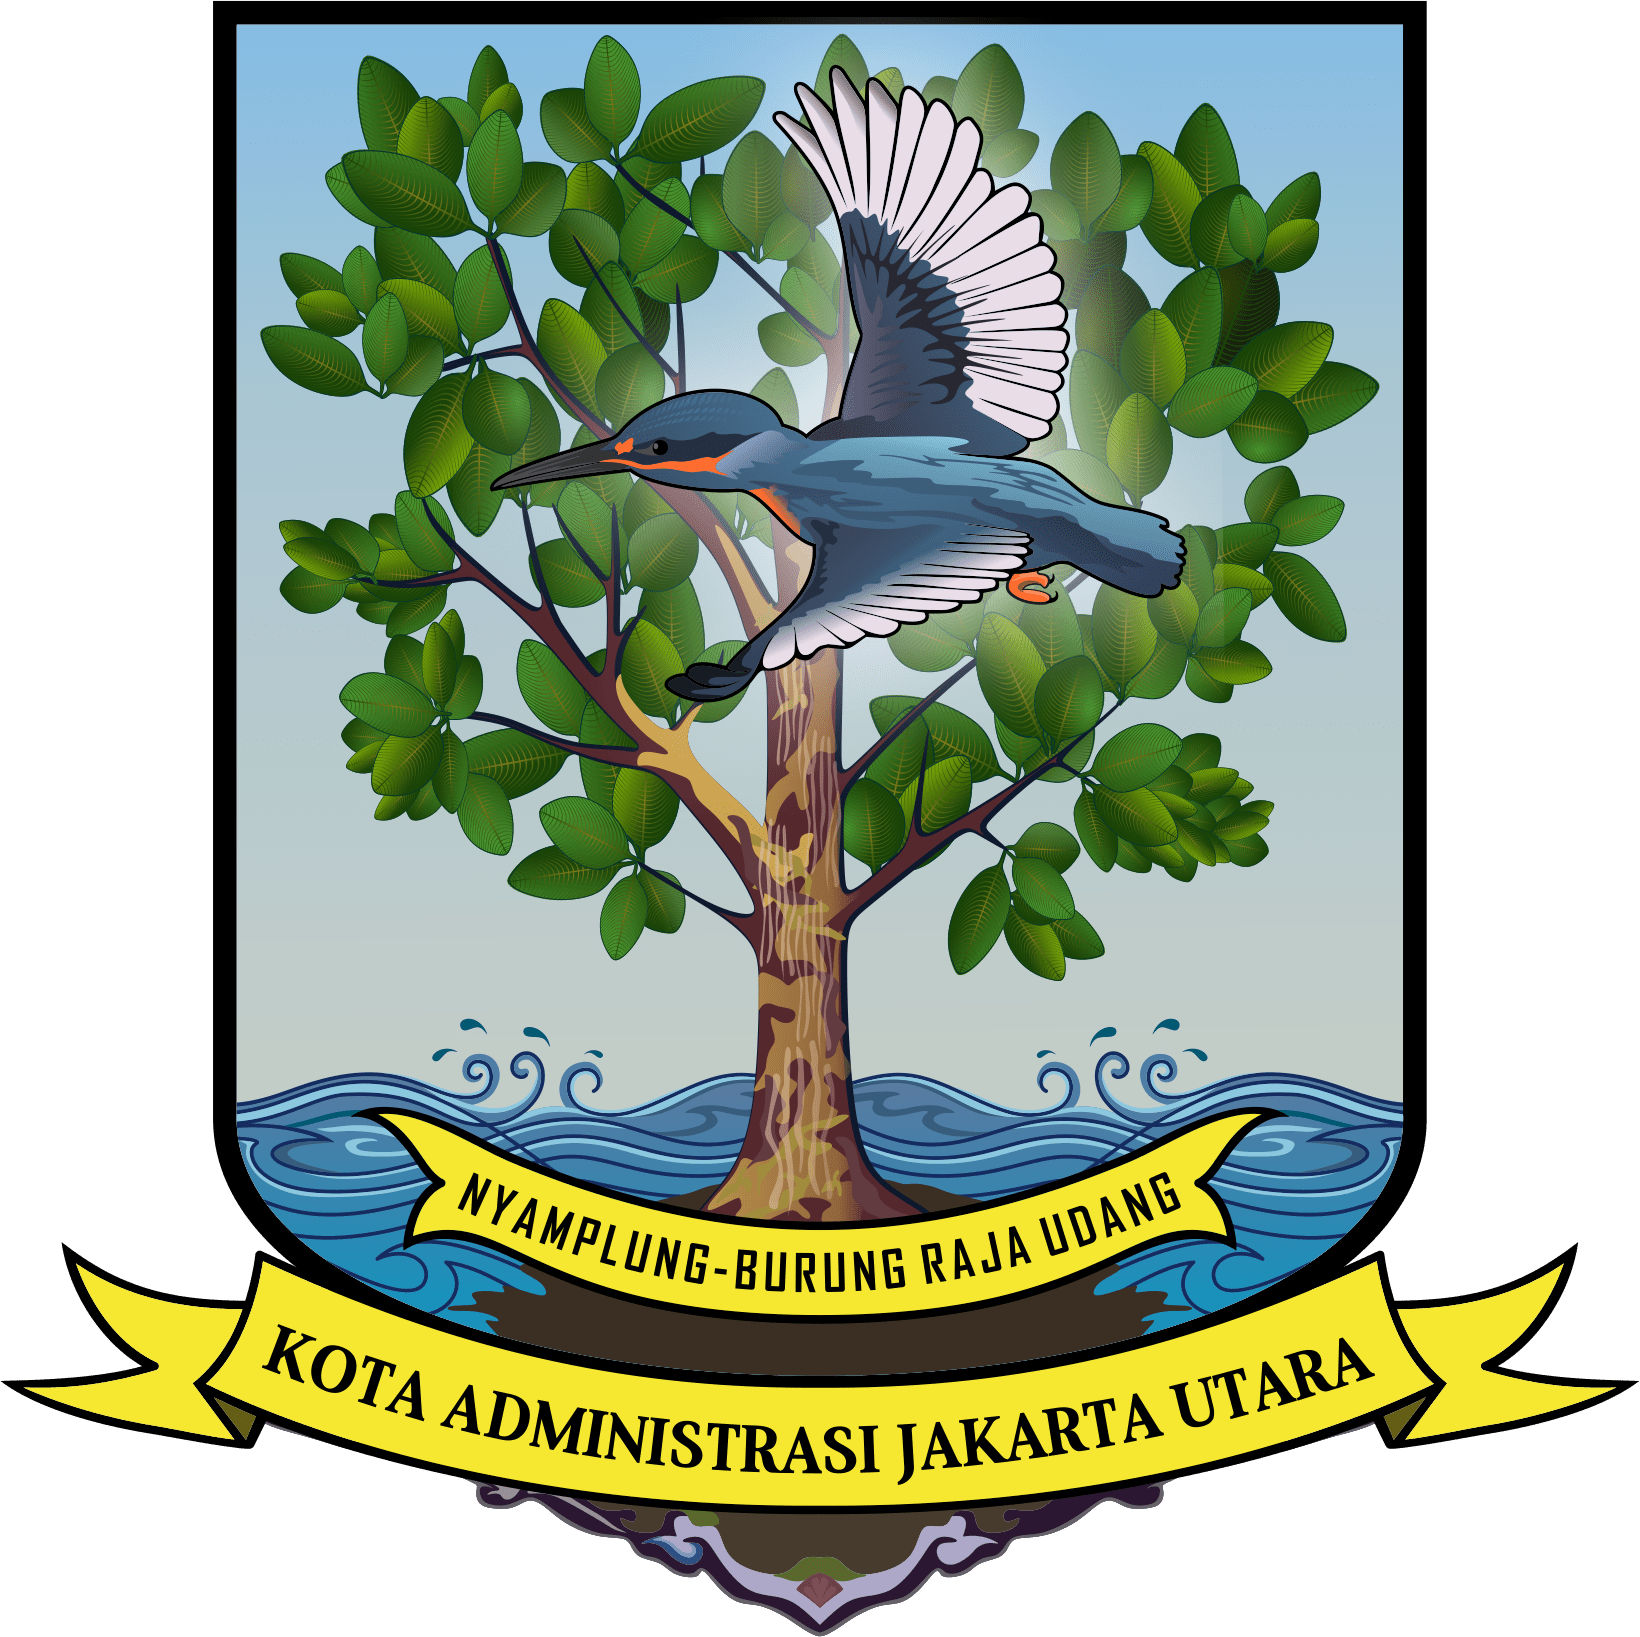 Jakarta Utara HOBI TERNAK Pengiriman Ayam Polan Menuju Jl. Pluit Raya Jakarta Utara word2